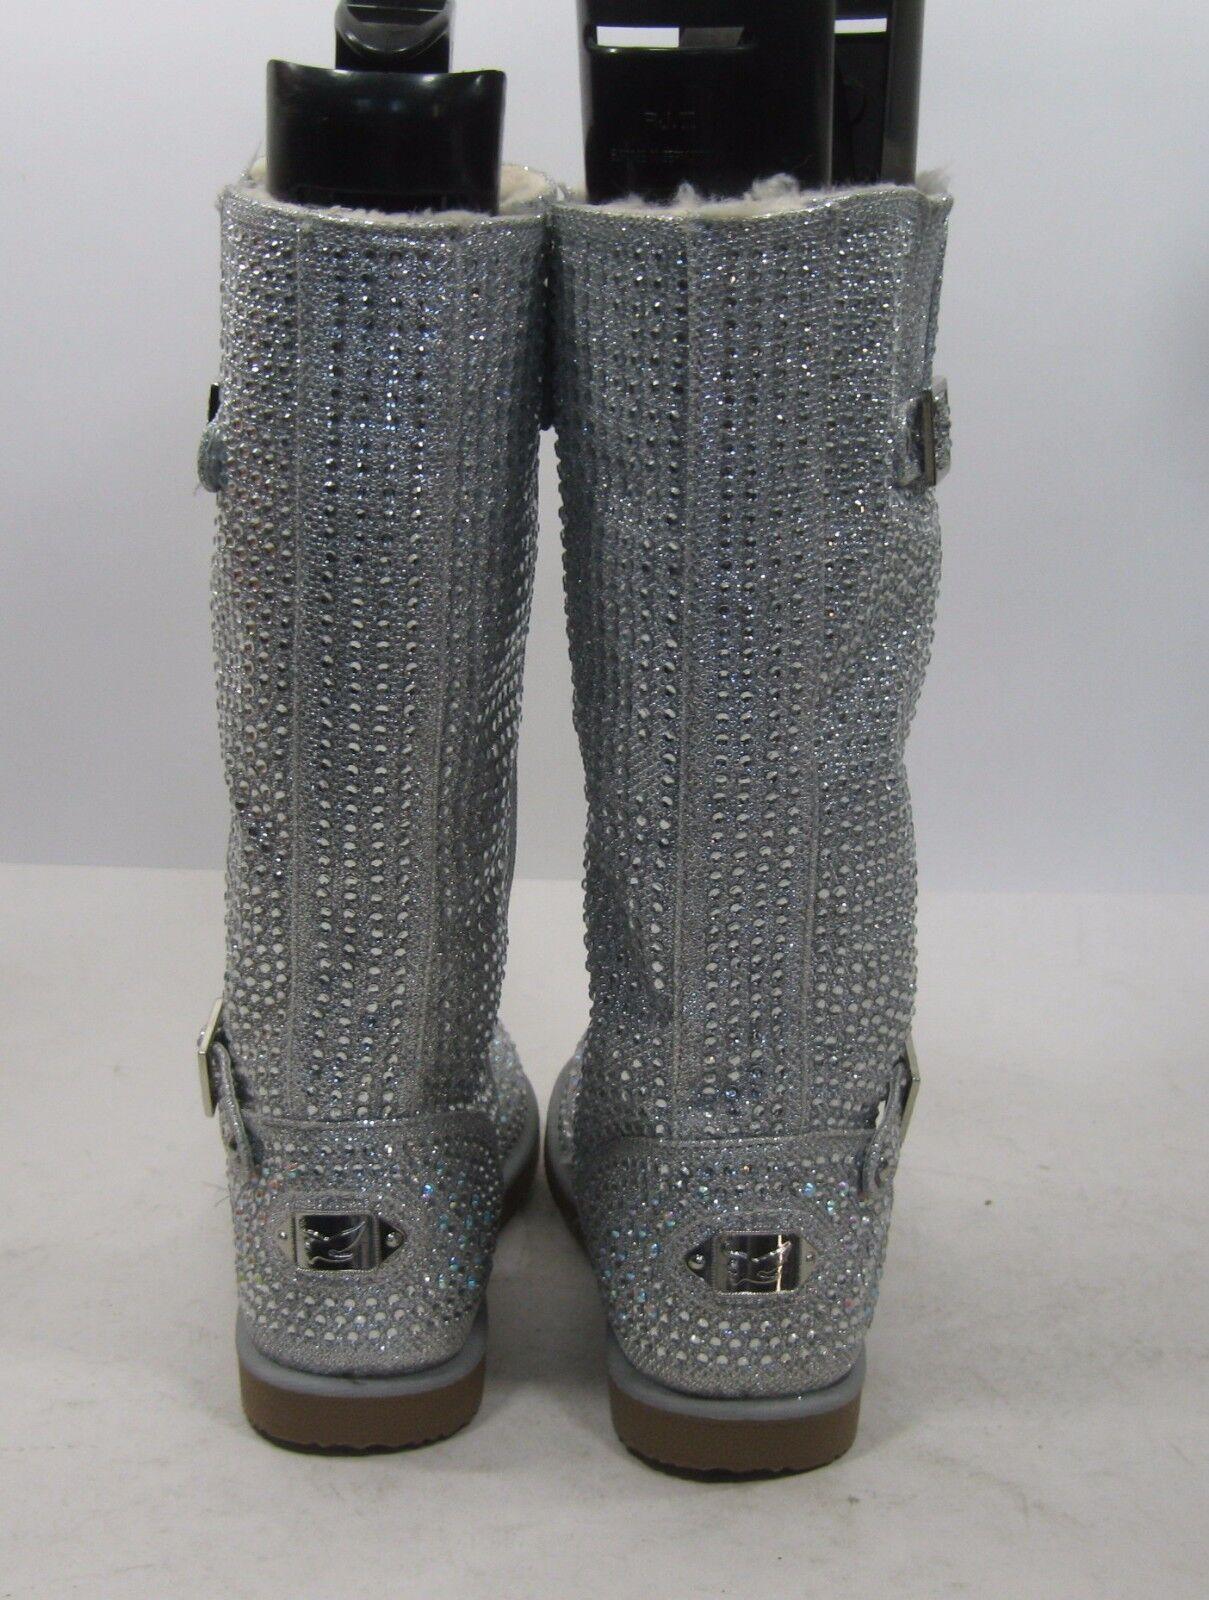 Neu Damen Silber Strass Winter Winter Winter Sexy Wadenhoch Stiefel Fellfutter Größe 7.5 60c657